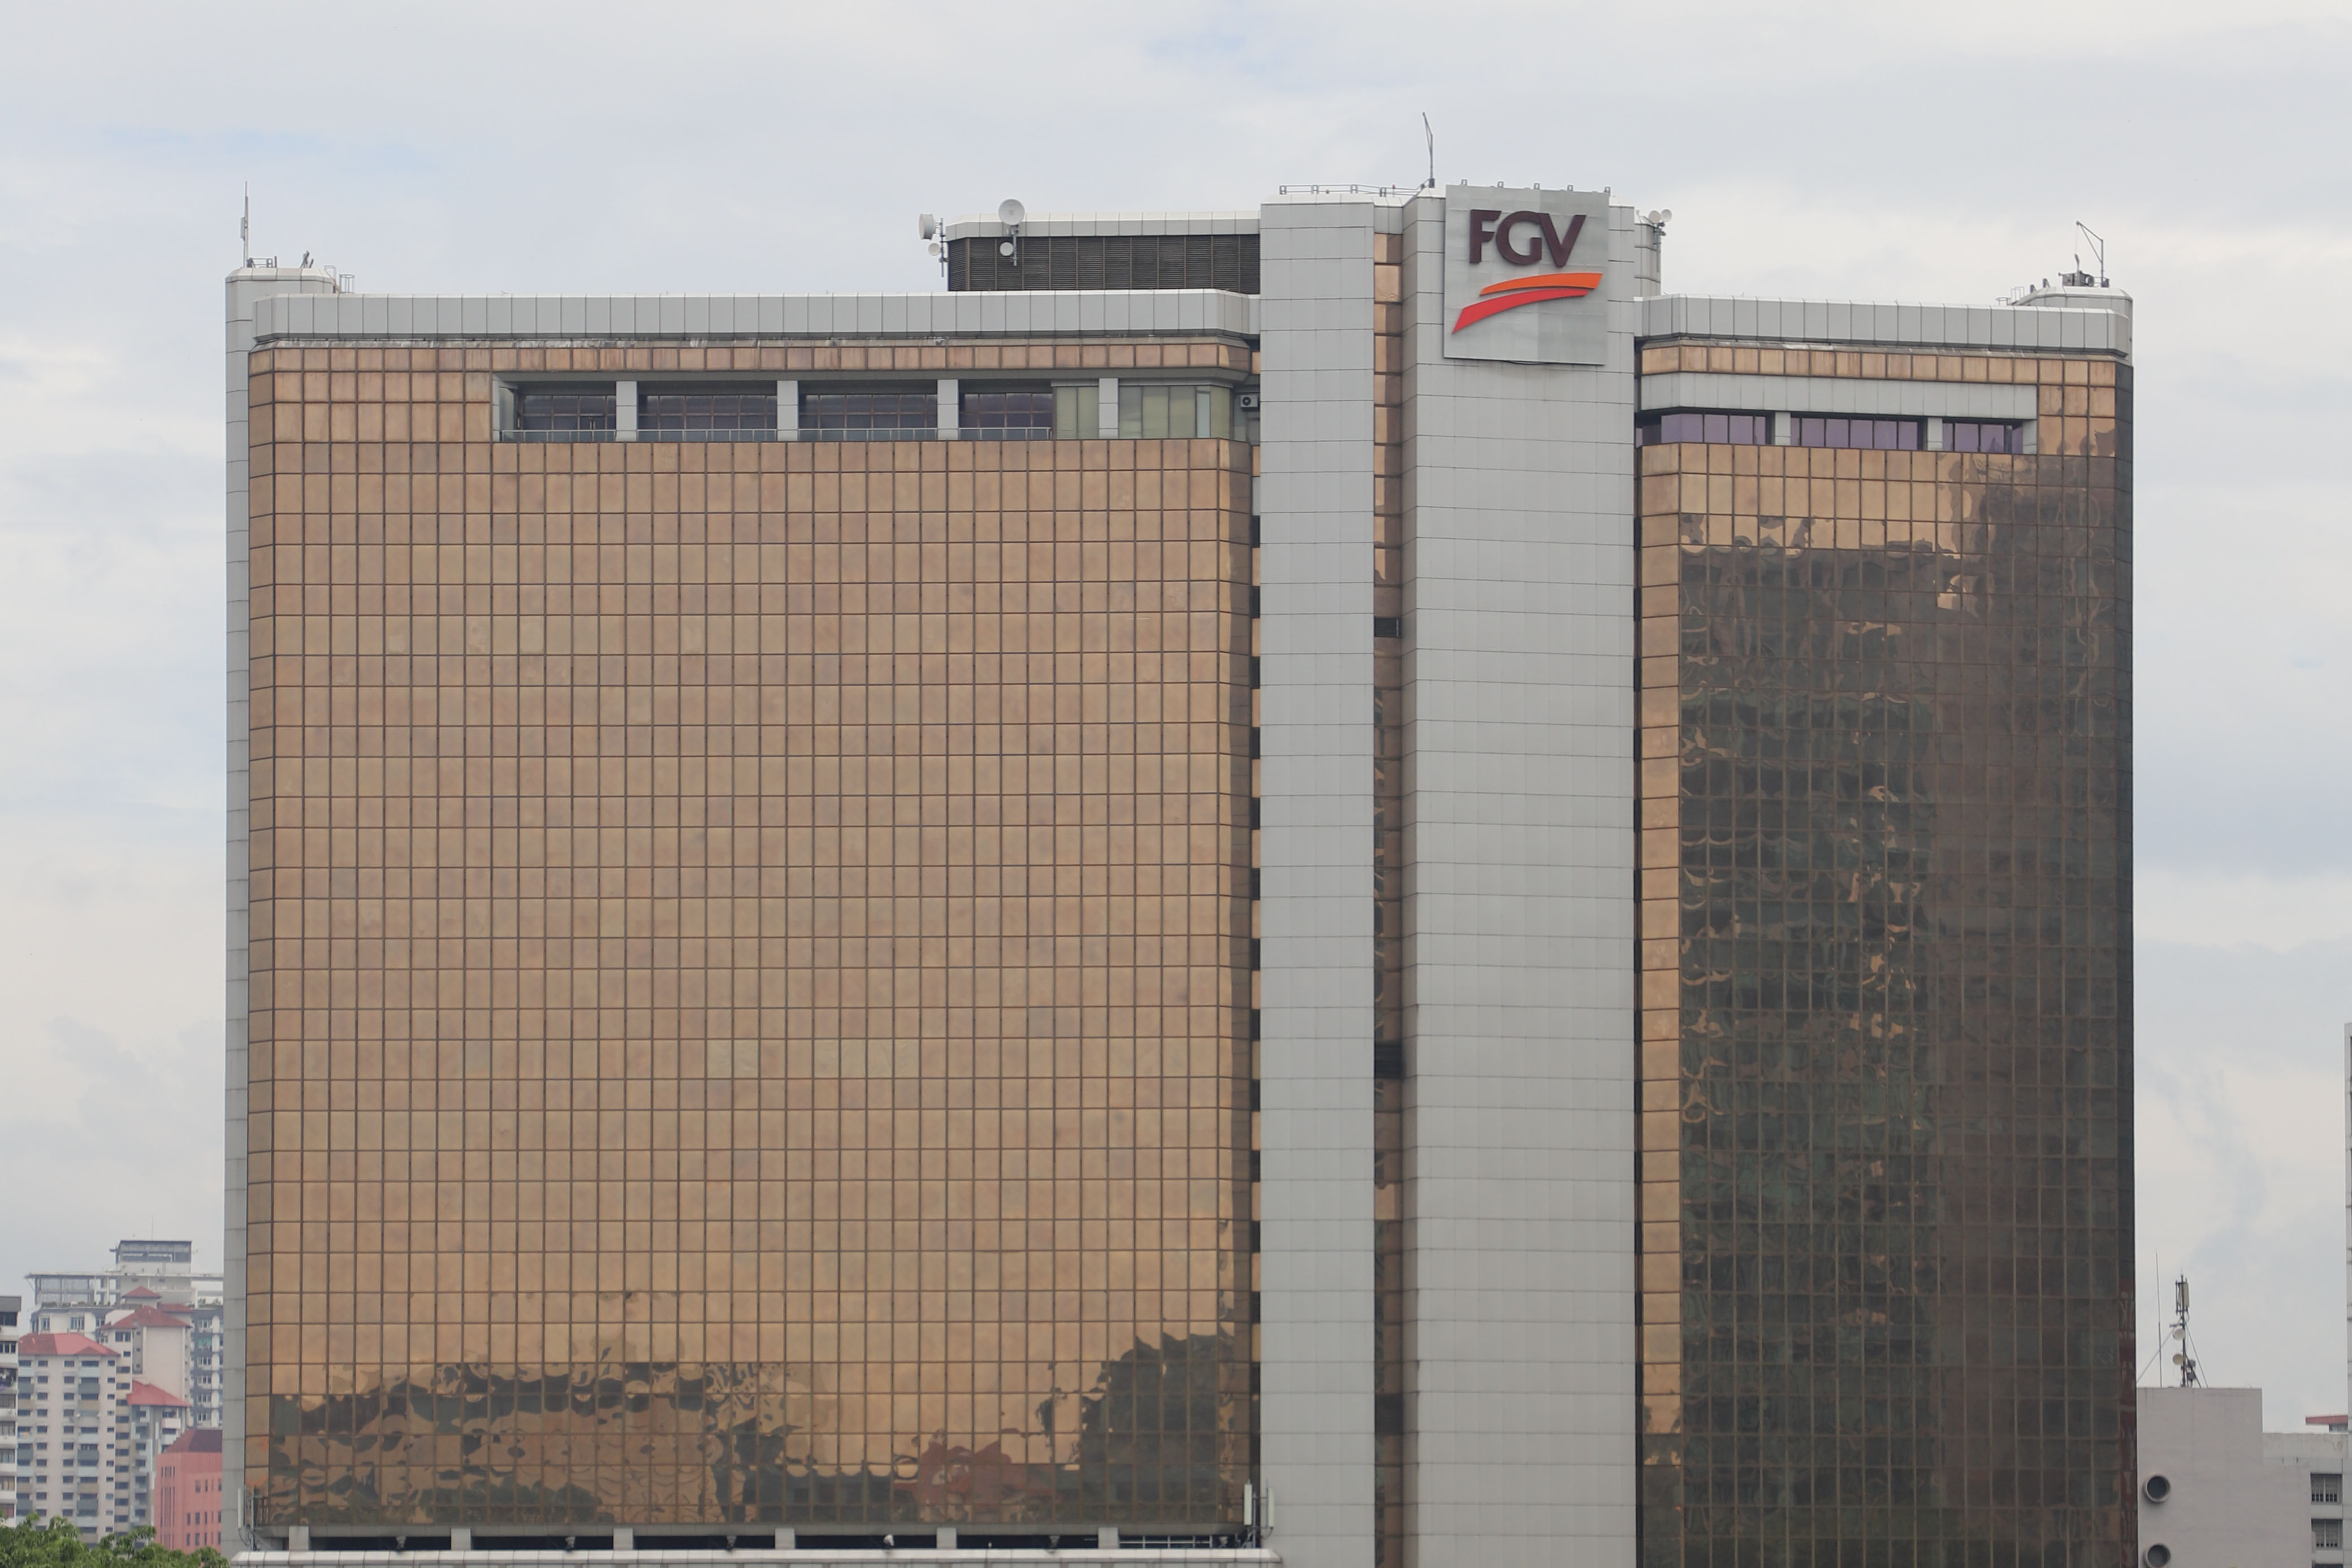 FGV calls for EGM, proposes slashing chairman's fee in half